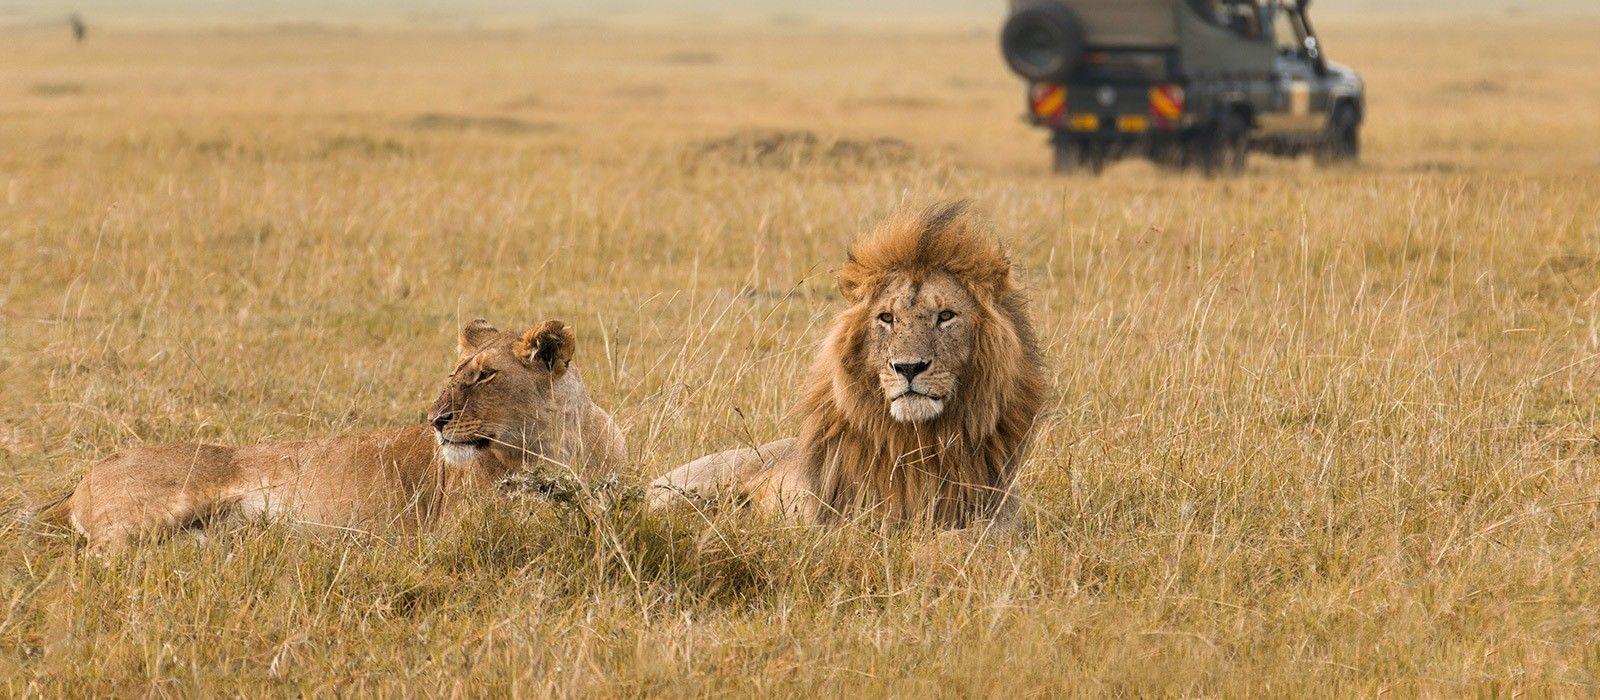 Kenya Off the Beaten Track Tour Trip 5